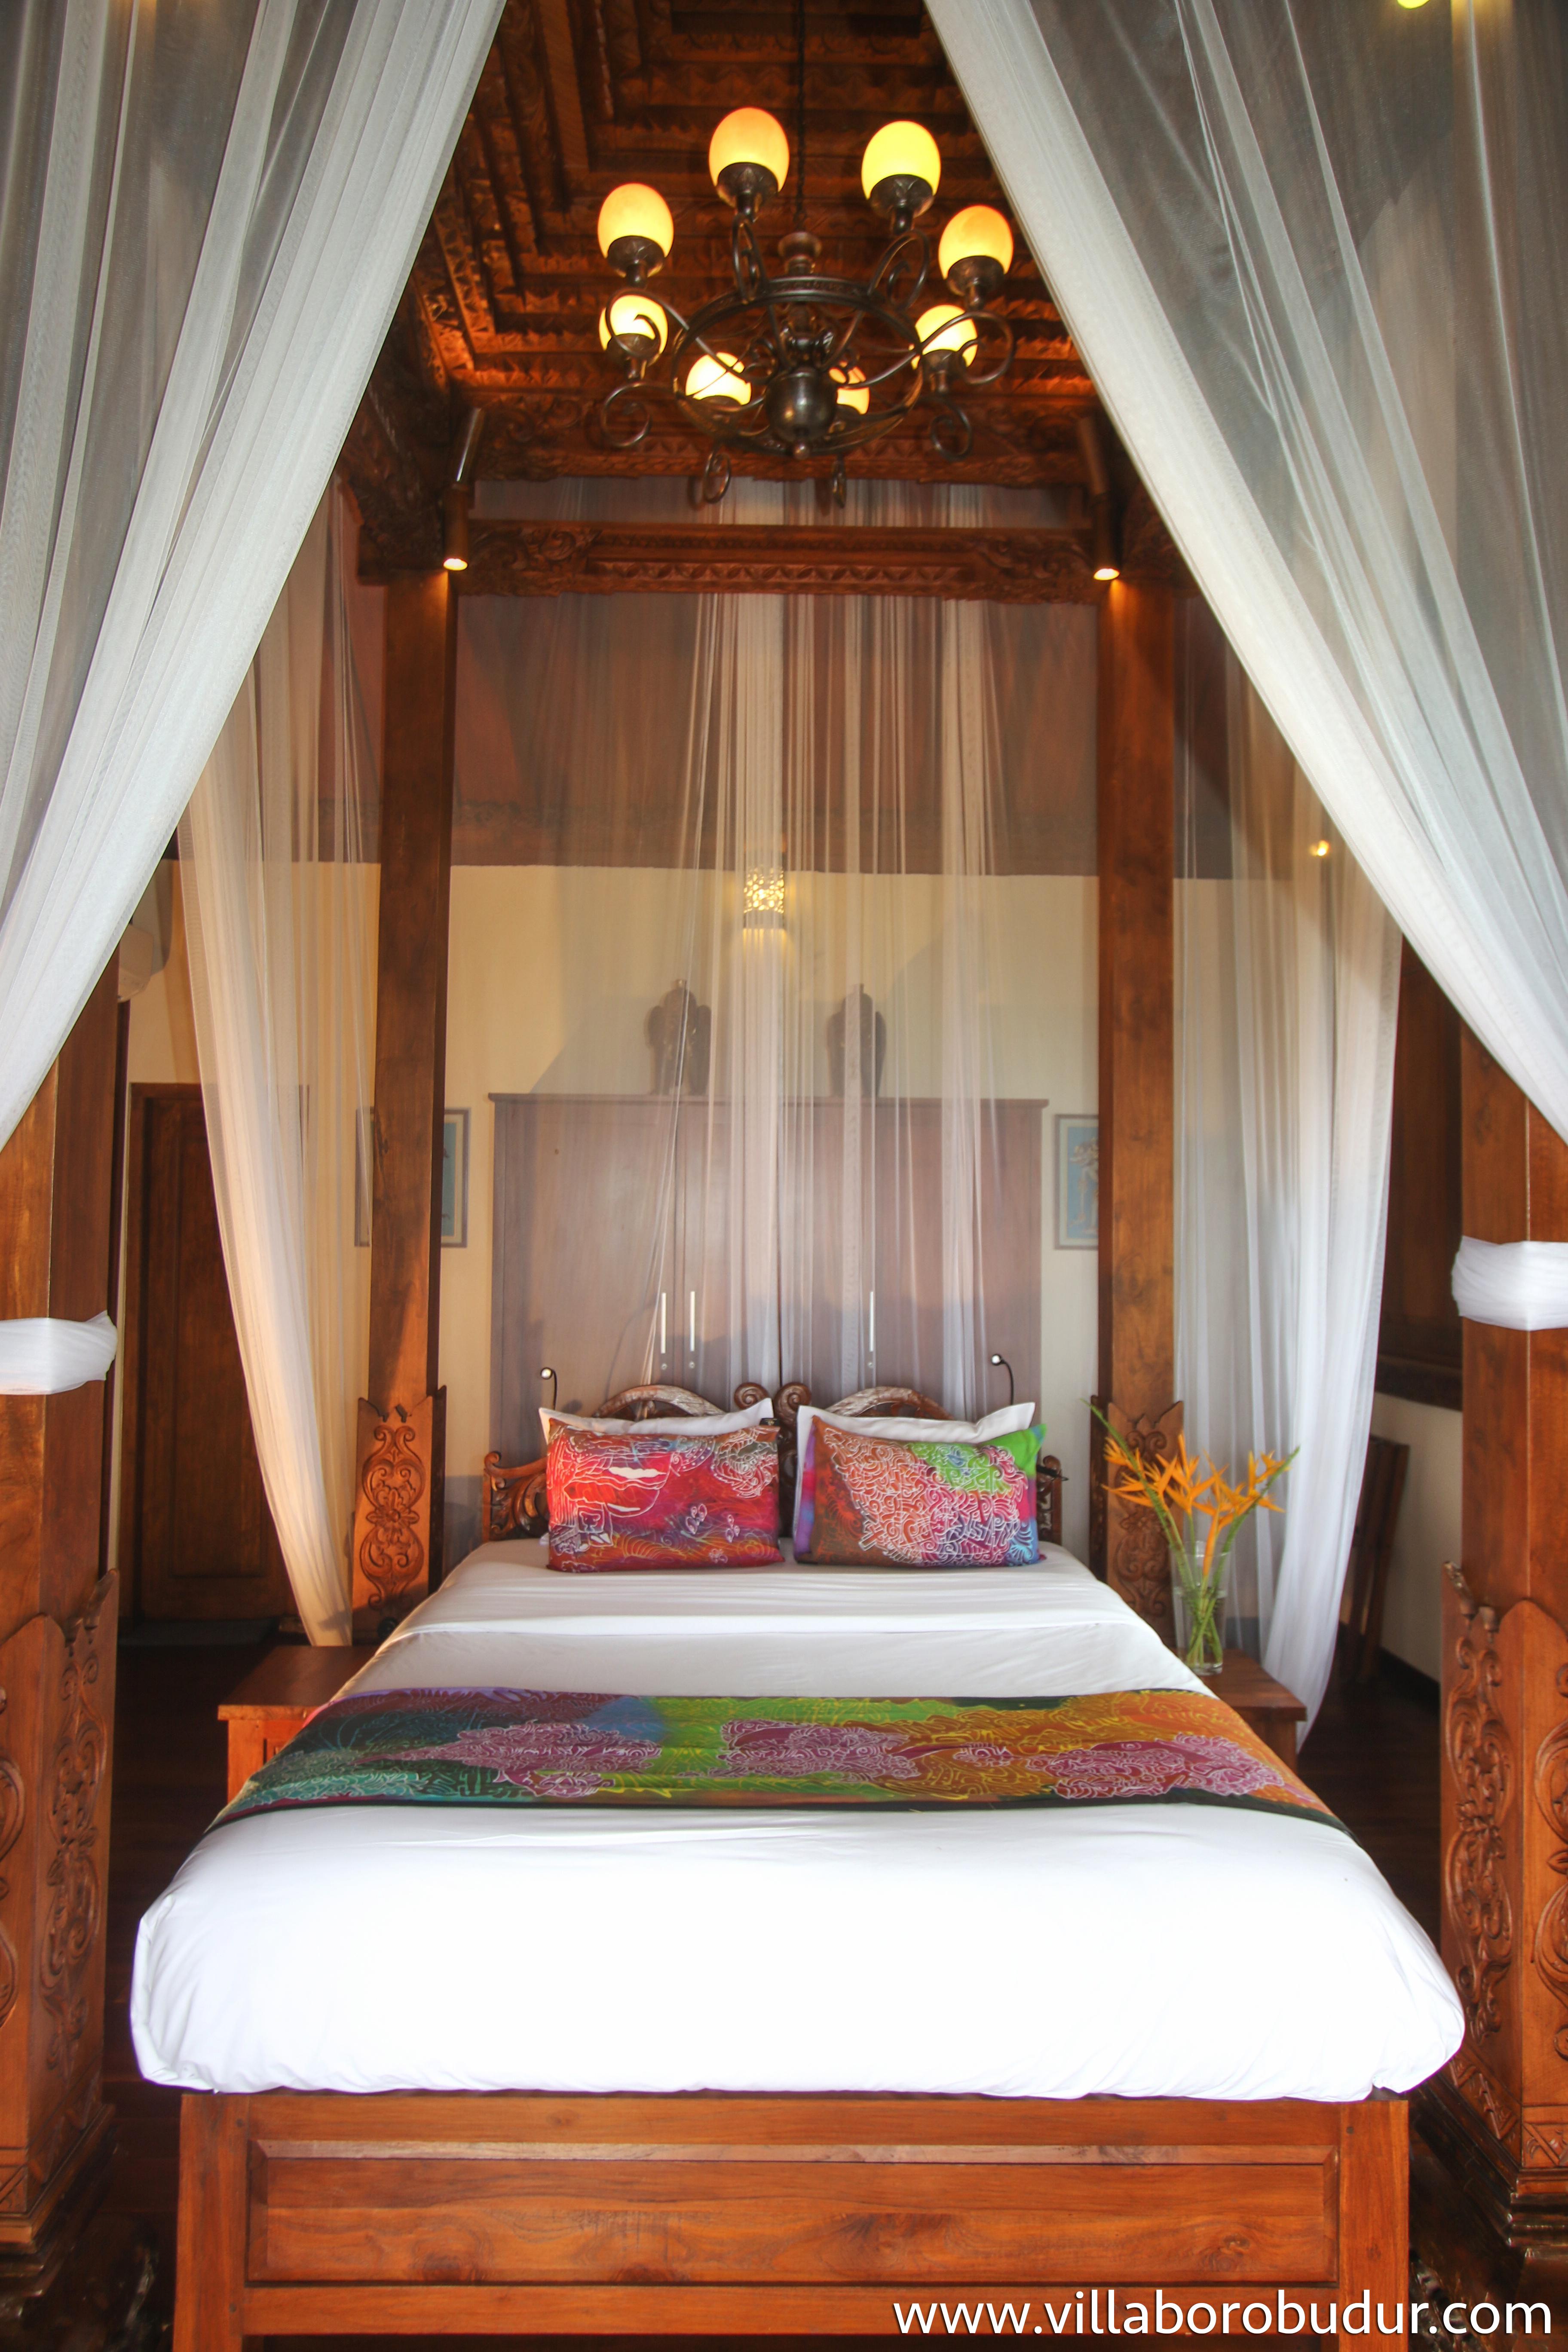 kayangan-sleeping-room-first-1-site